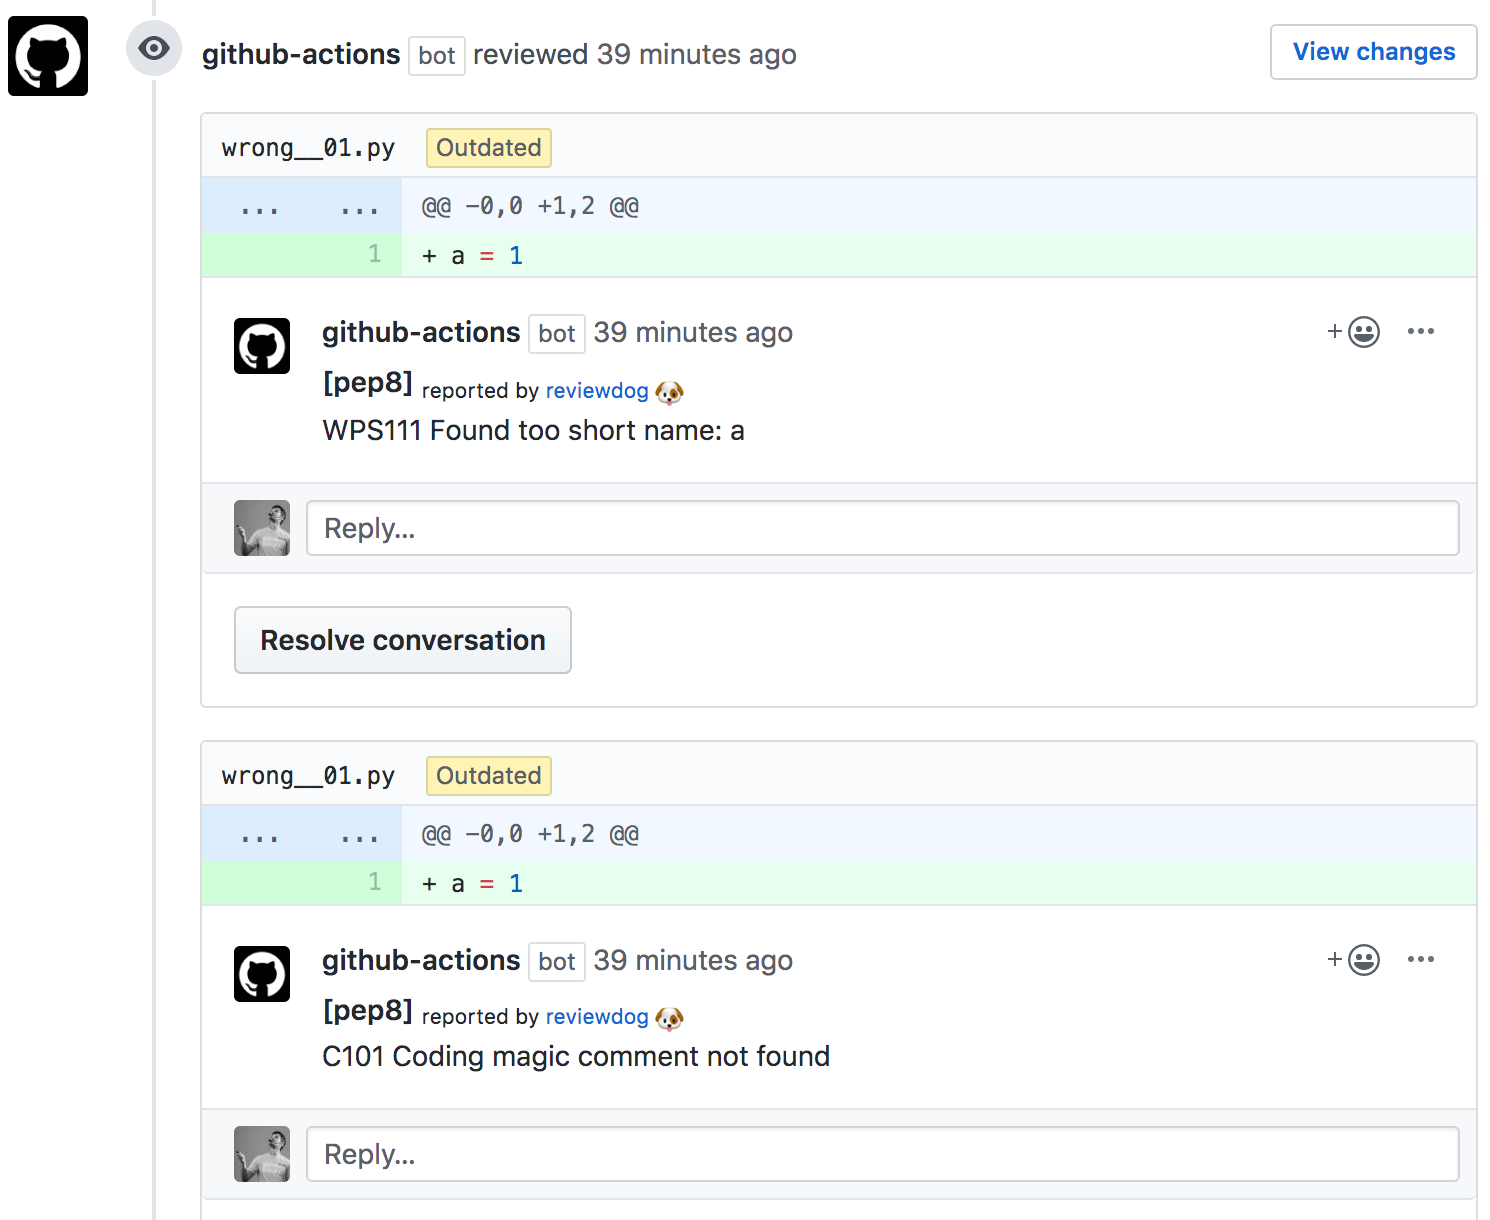 https://raw.githubusercontent.com/wemake-services/wemake-python-styleguide/master/docs/_static/reviewdog.png